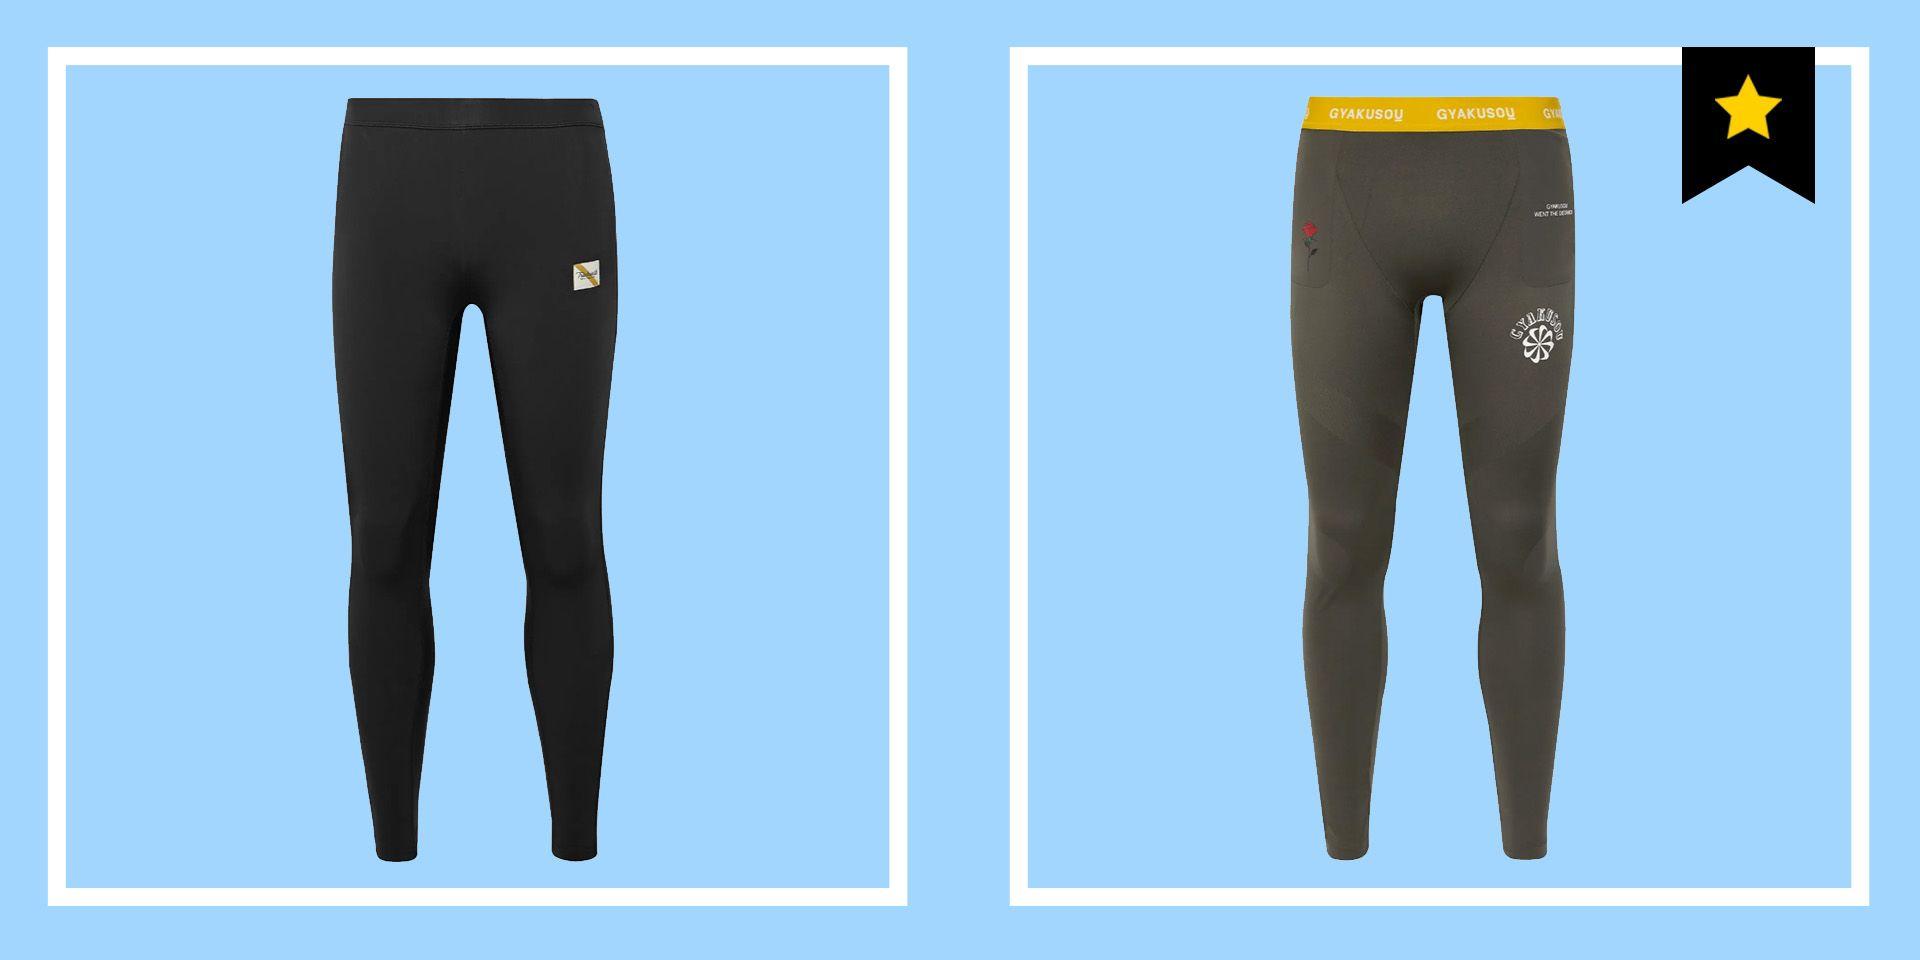 The 13 Best Compression Pants for Men